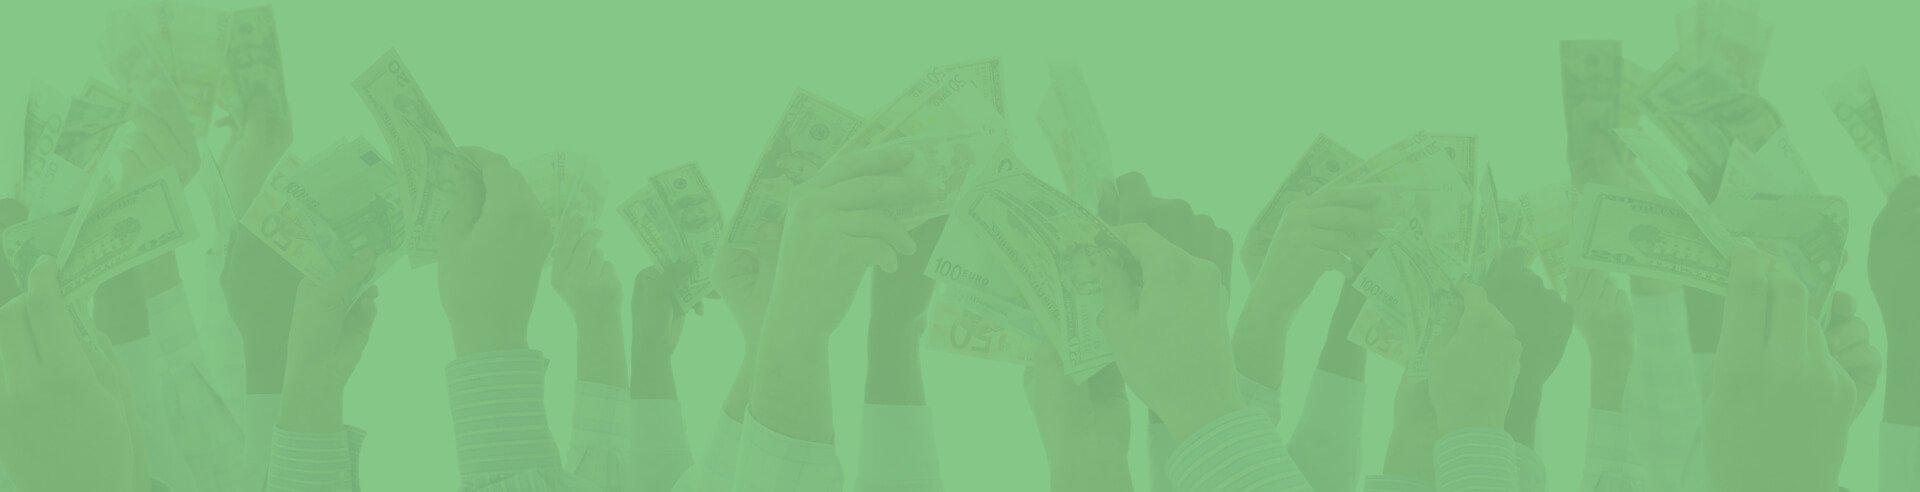 Donation Crowdfunding Script